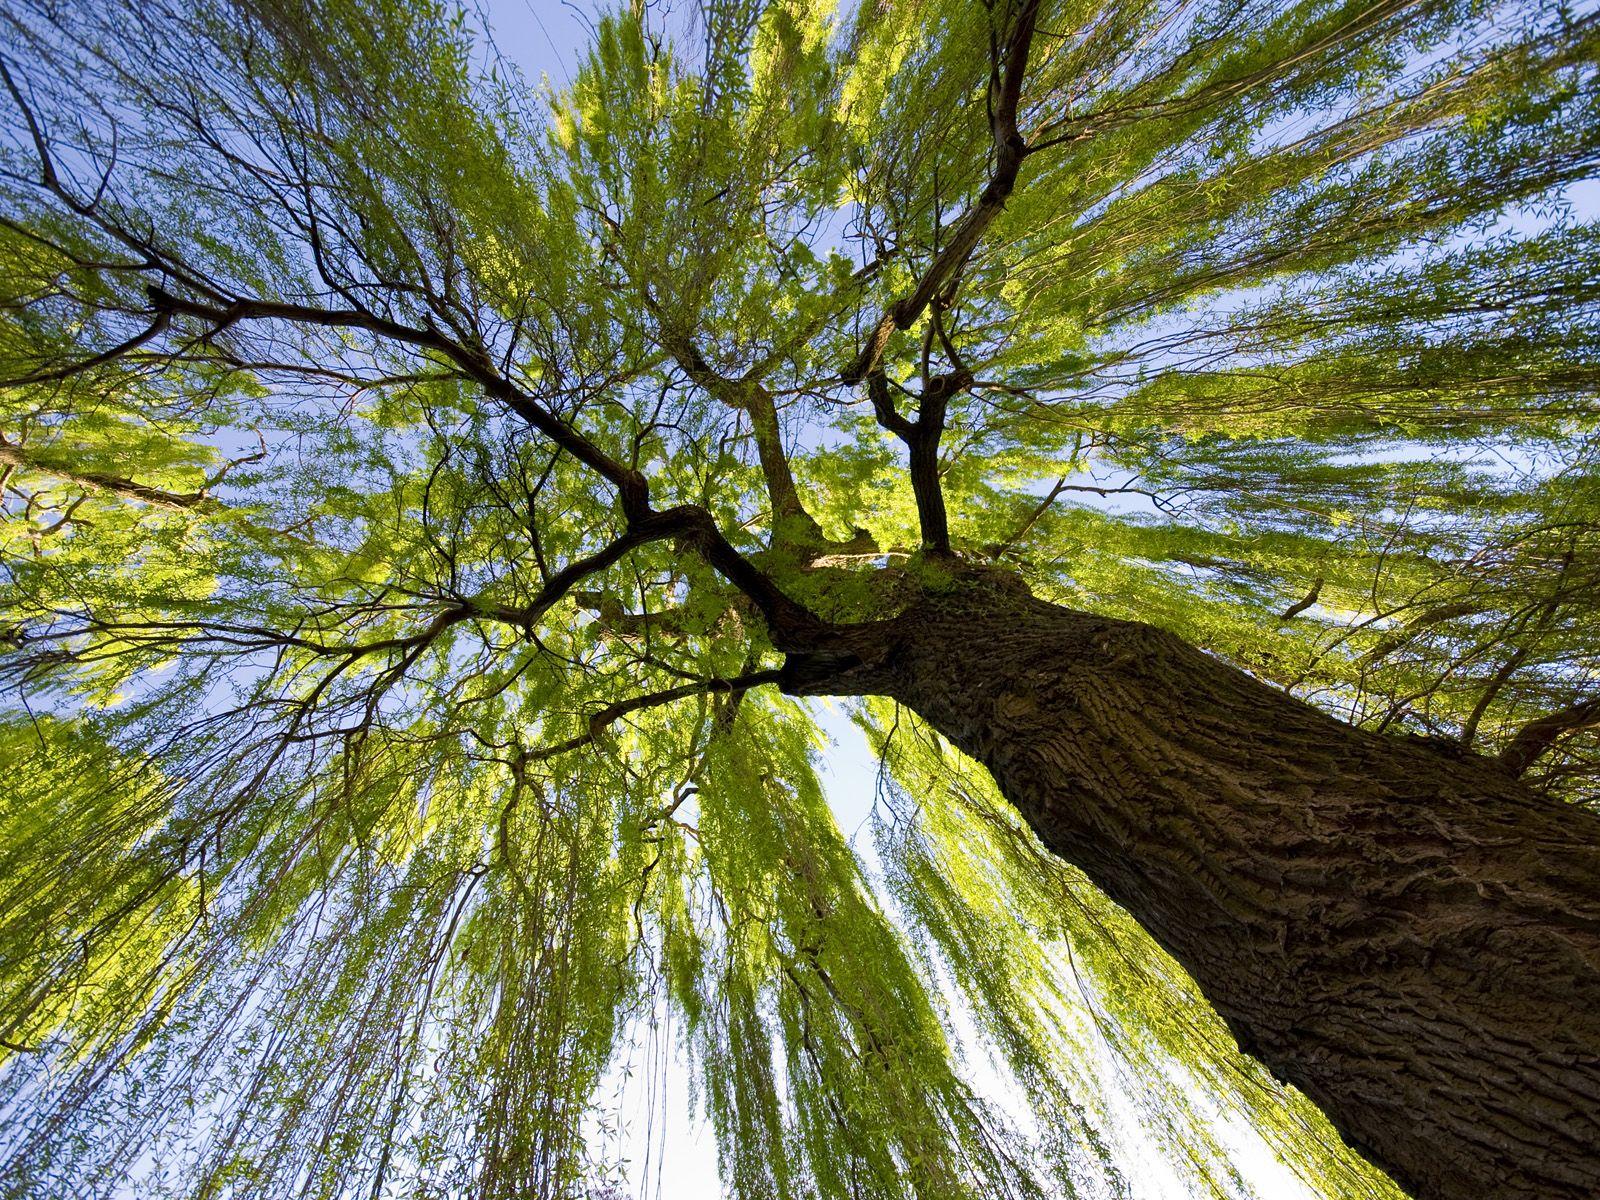 Willow Tree | Daisies N Trees | Pinterest | Willow tree, Trip ...